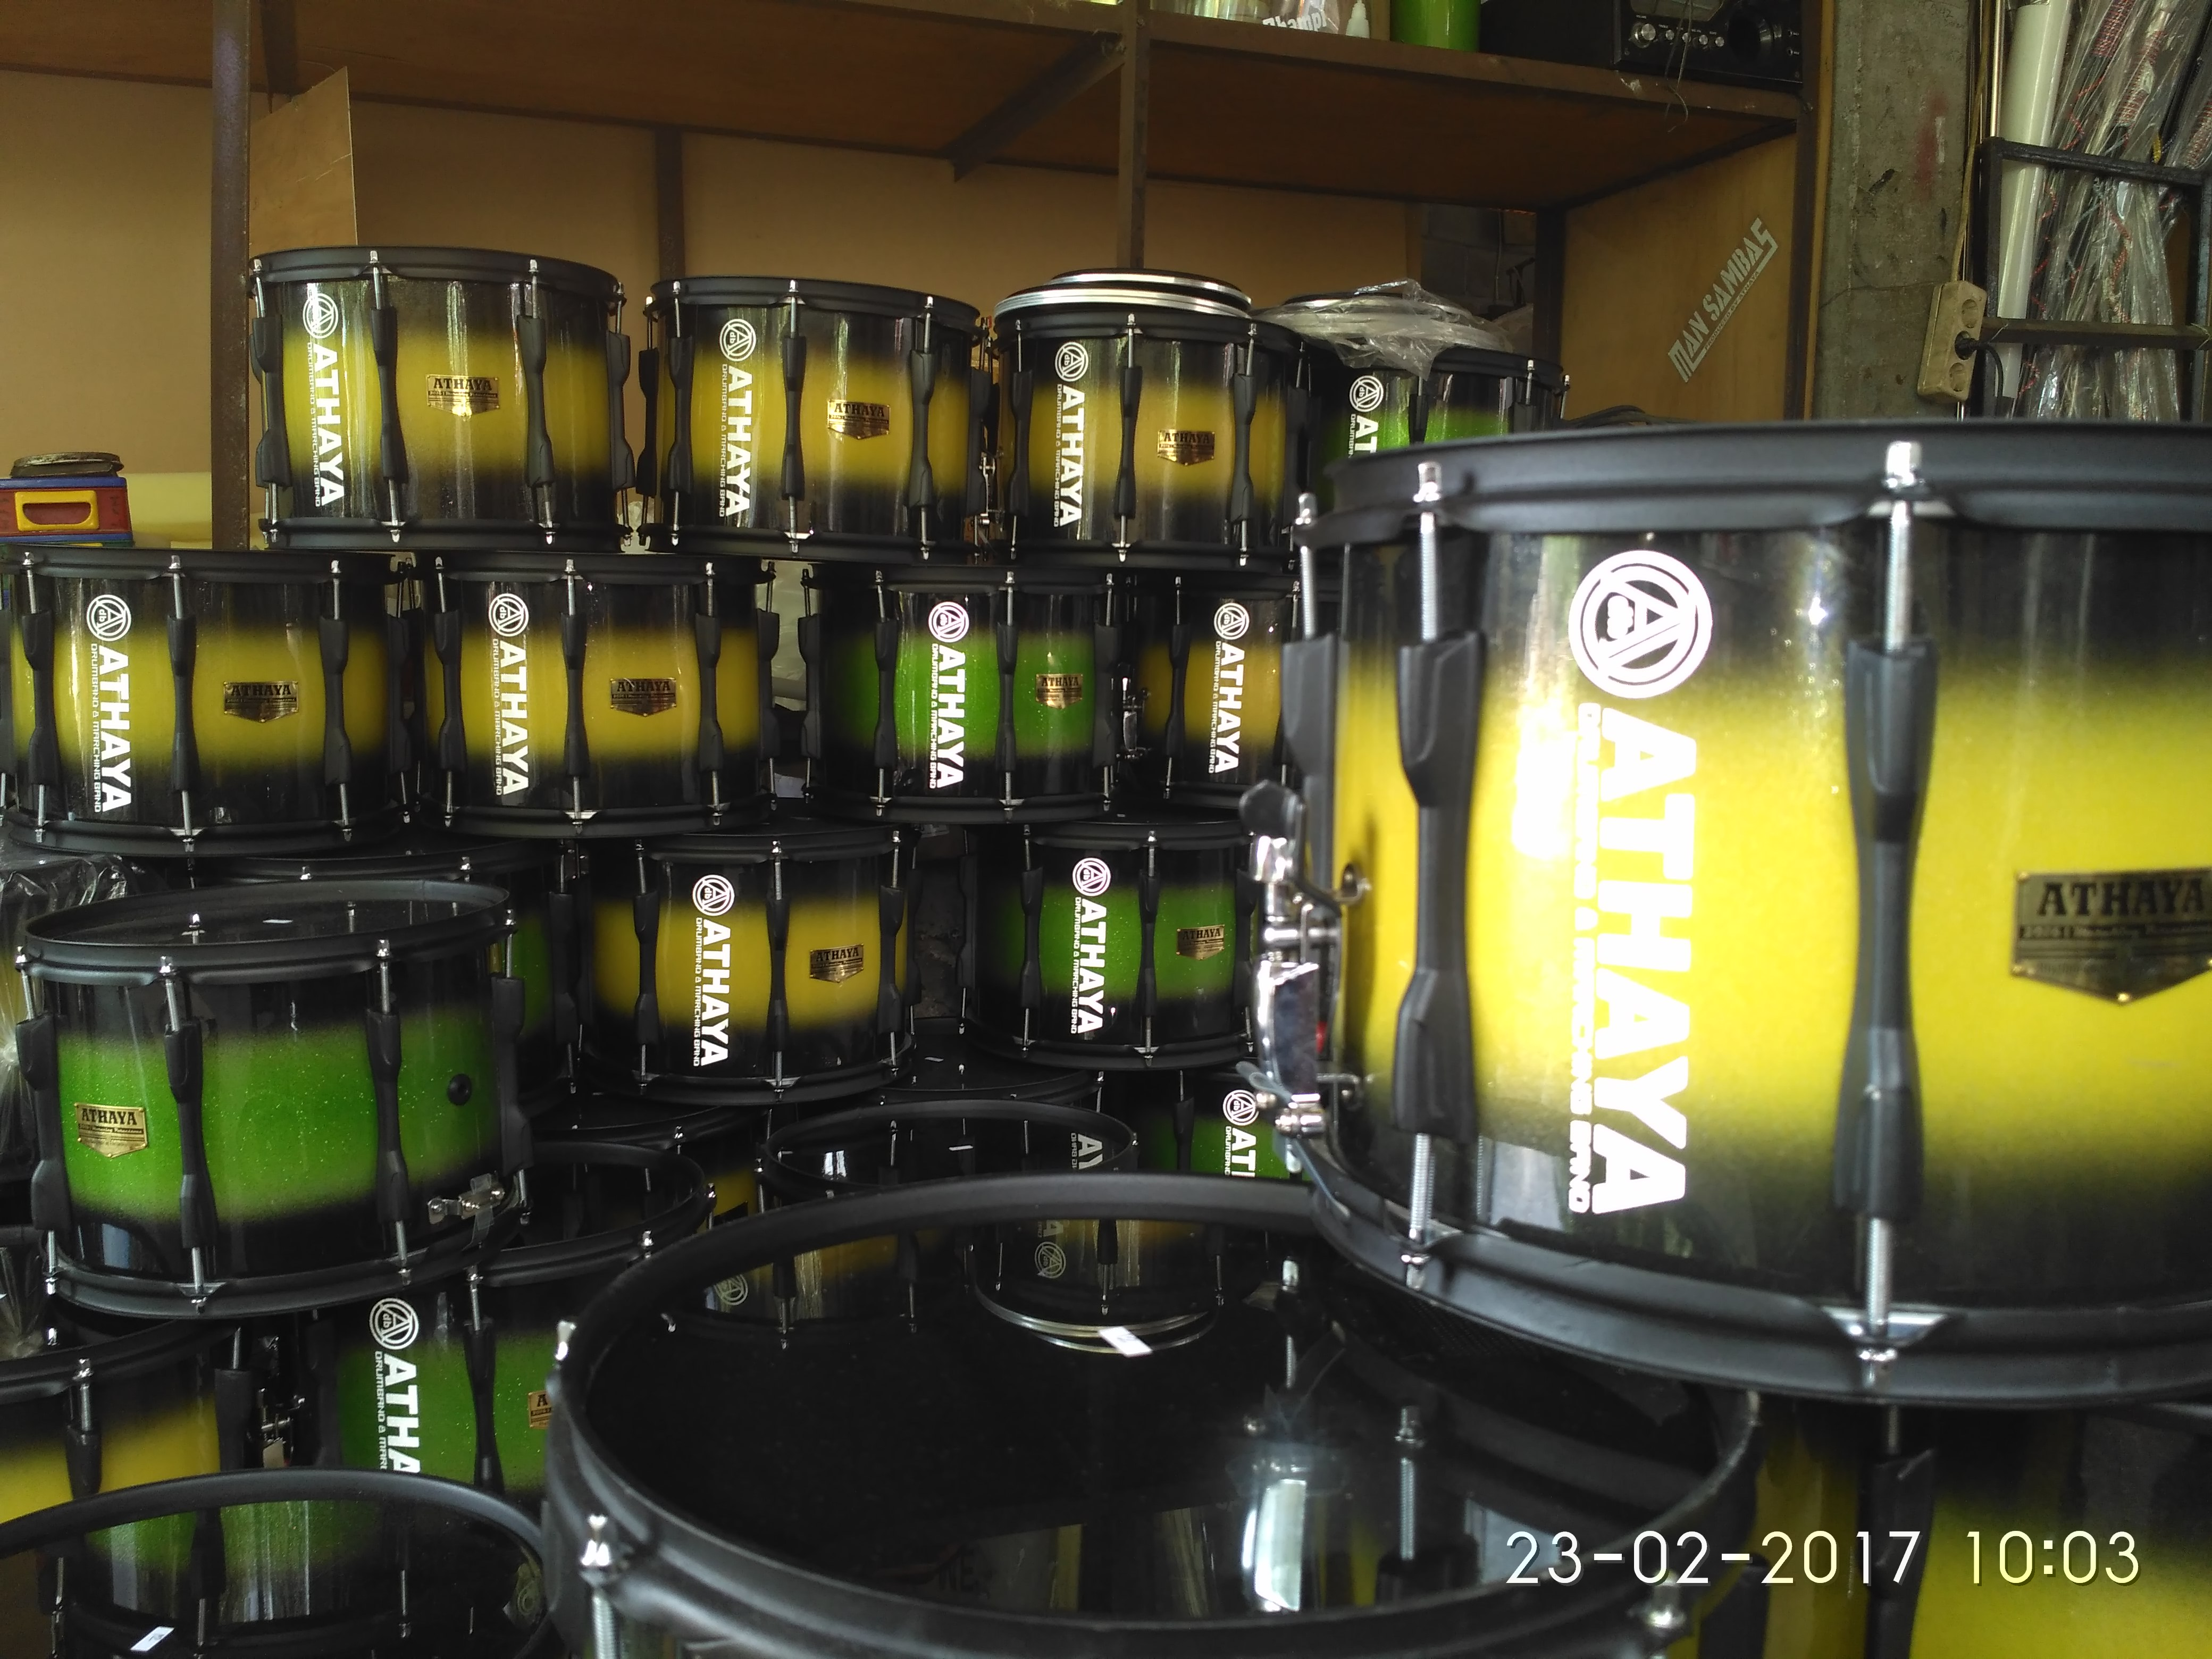 jual alat drumband jogja | daftar harga drumband sd